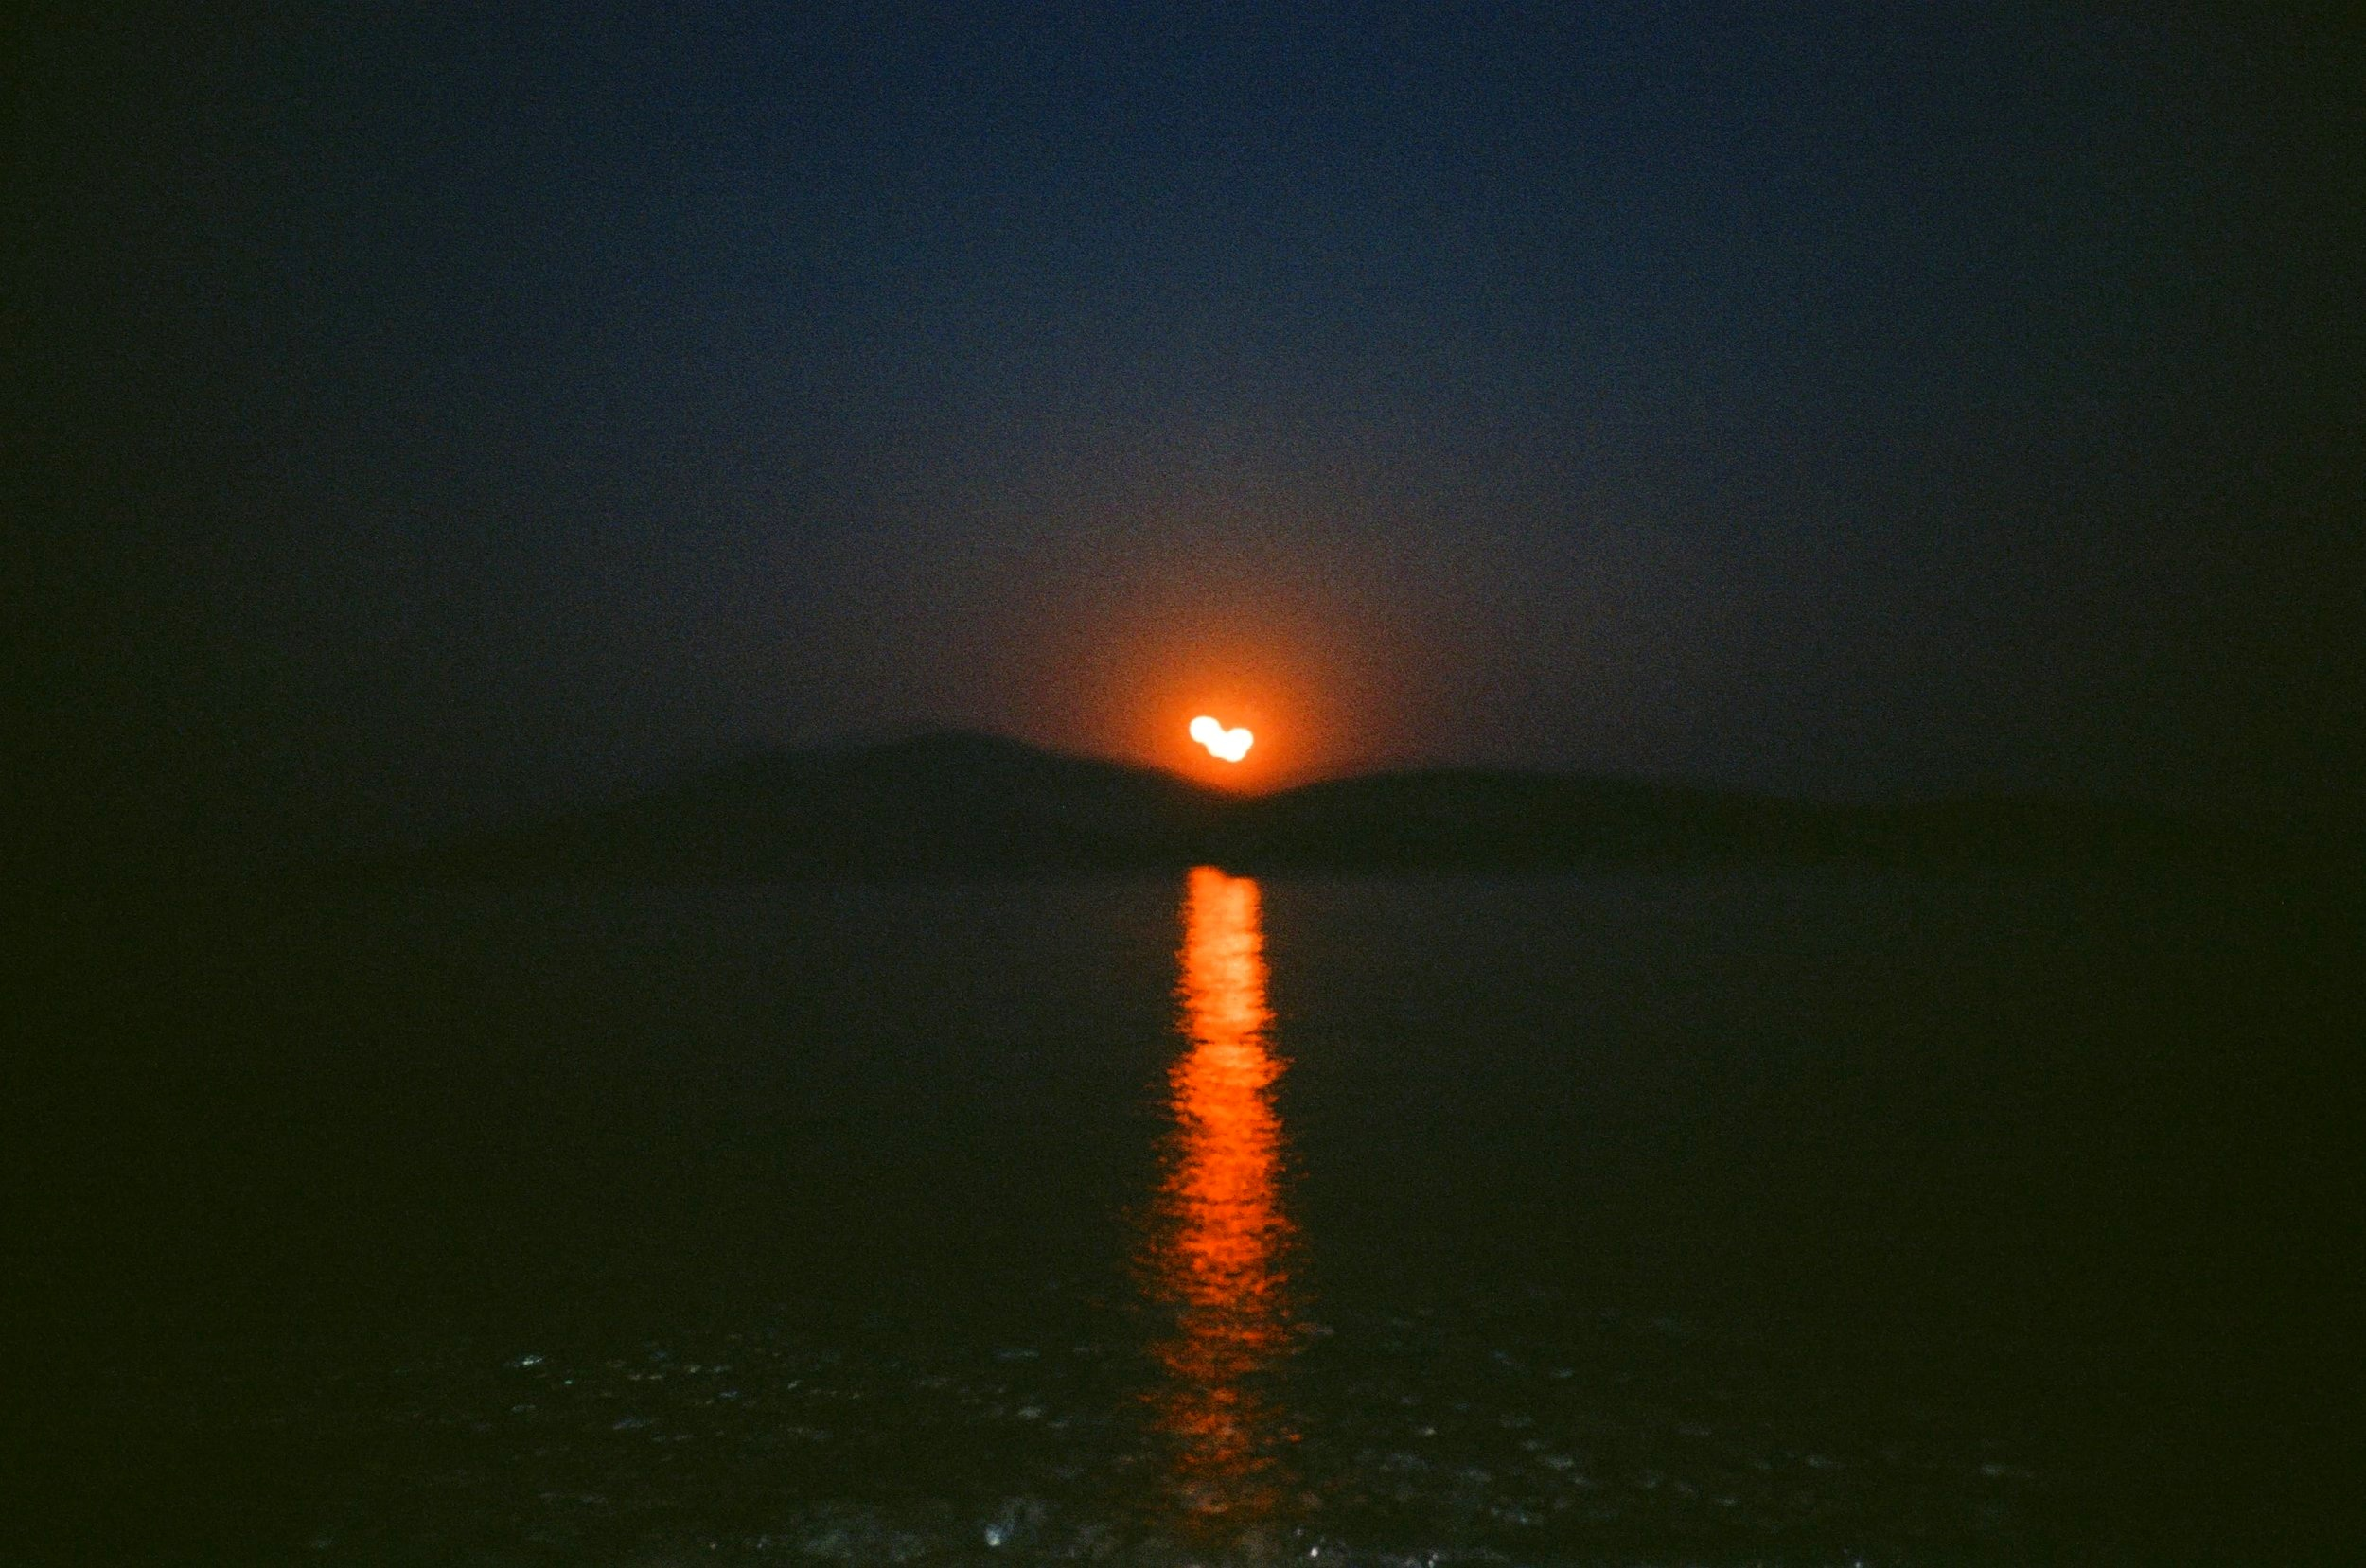 0016_15_ChristosVourlis_photography_CVHAIR_CVDIARY_personal diary__film_35mm_photo.jpg